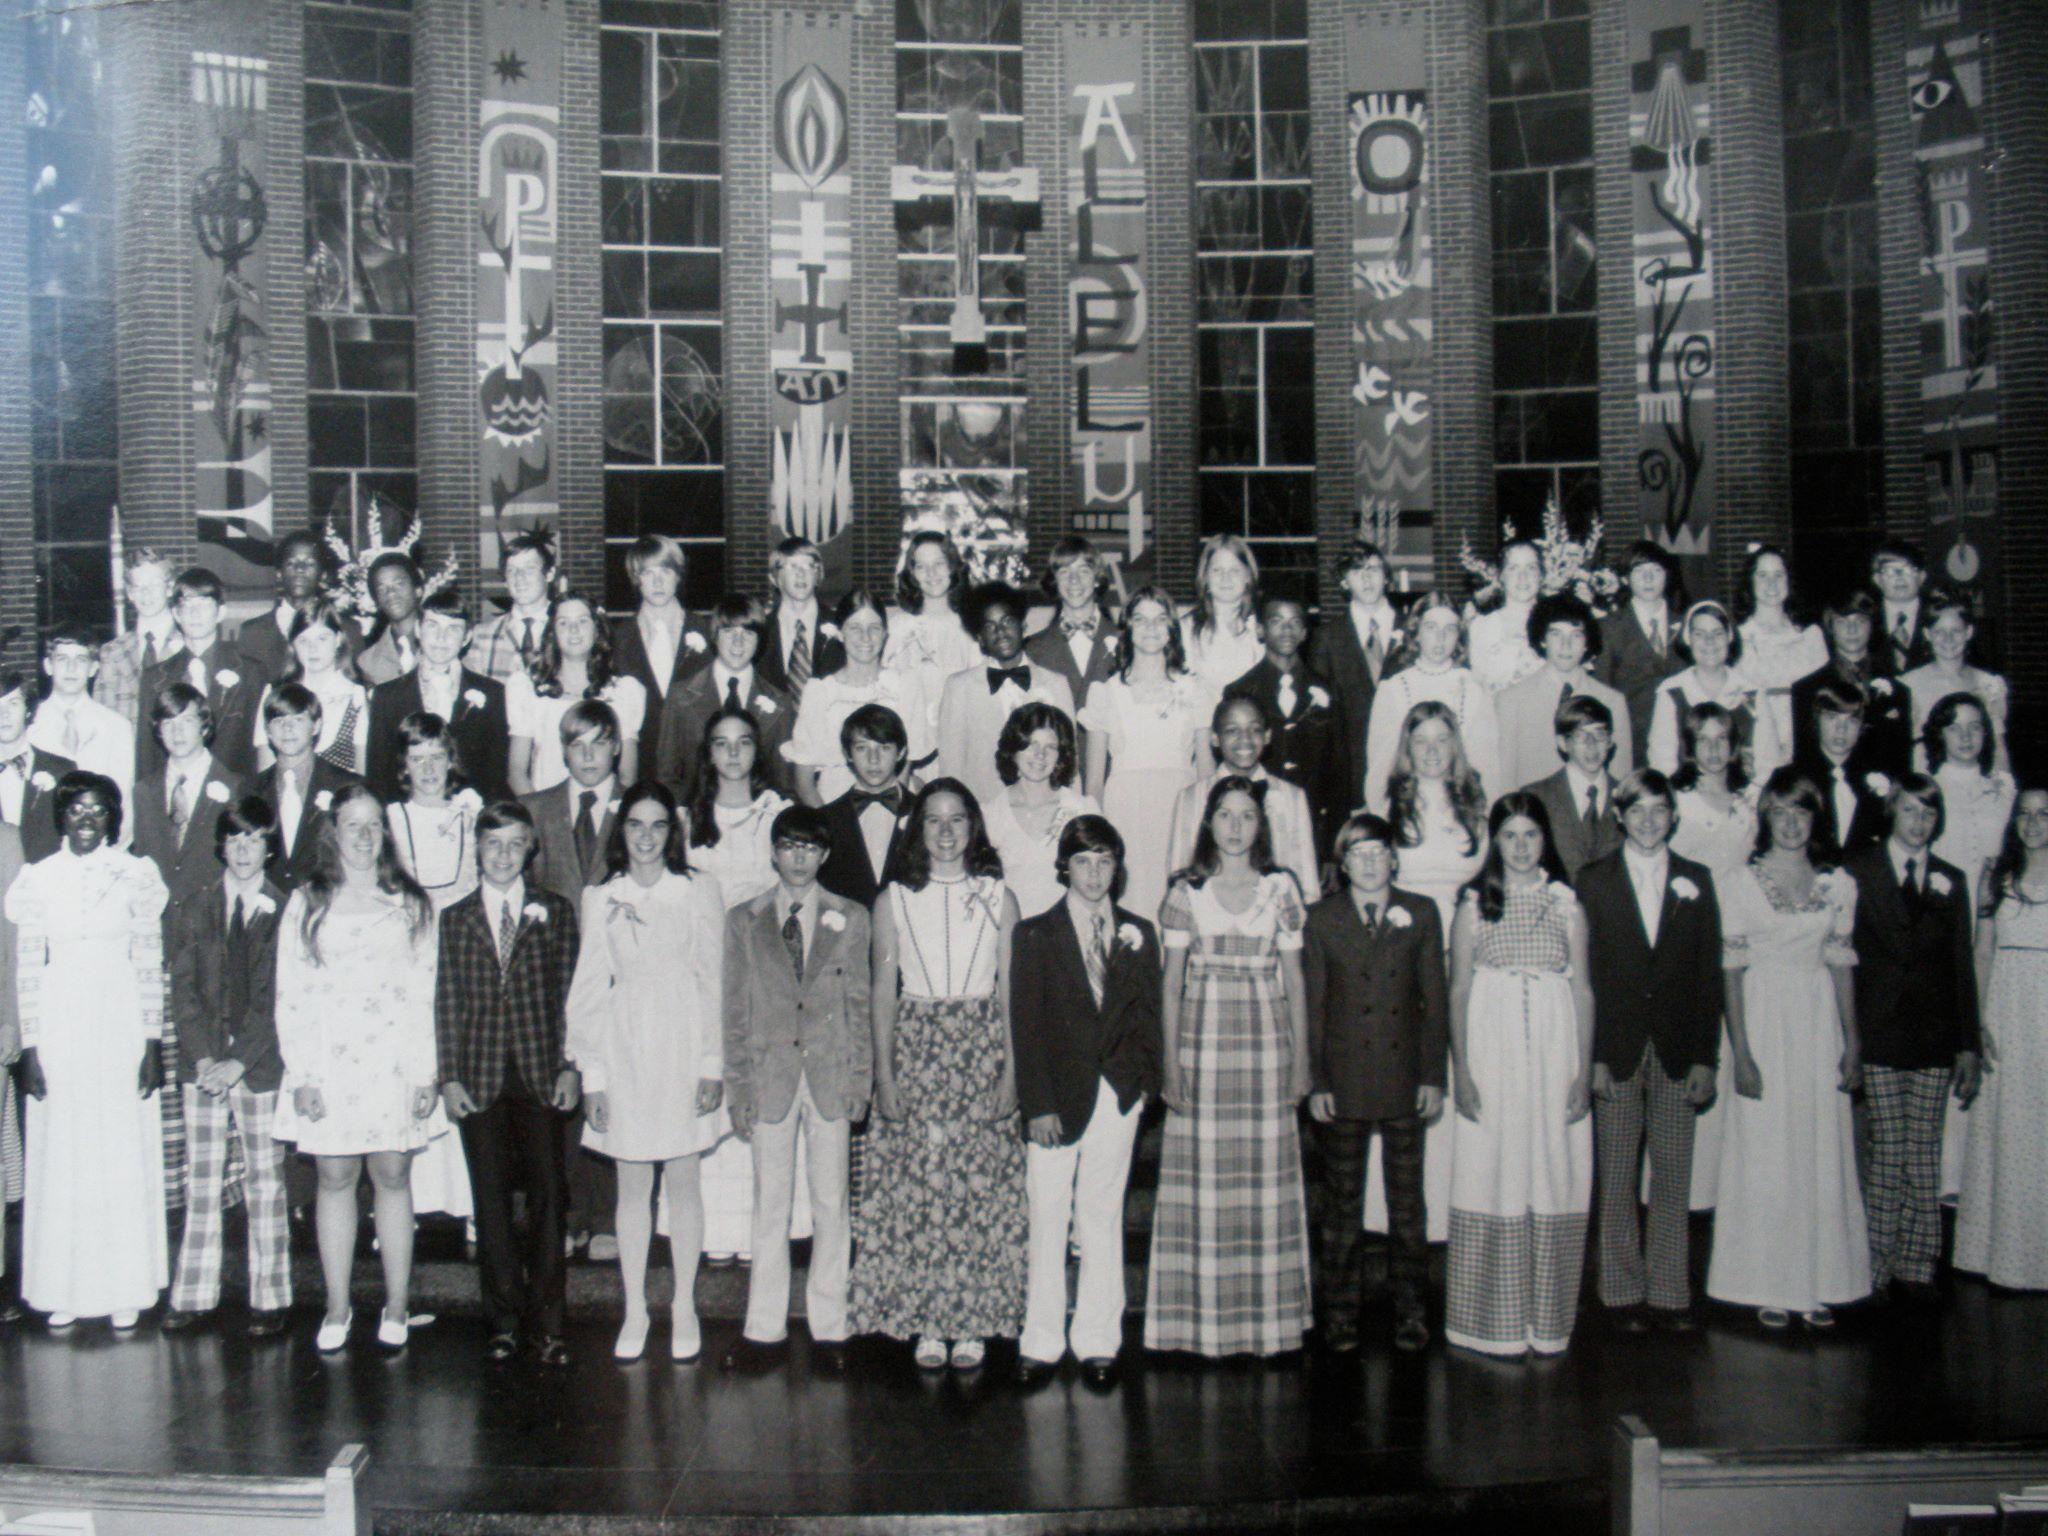 1973 St Peters eighth grade class, Kirkwood, Mo Growing